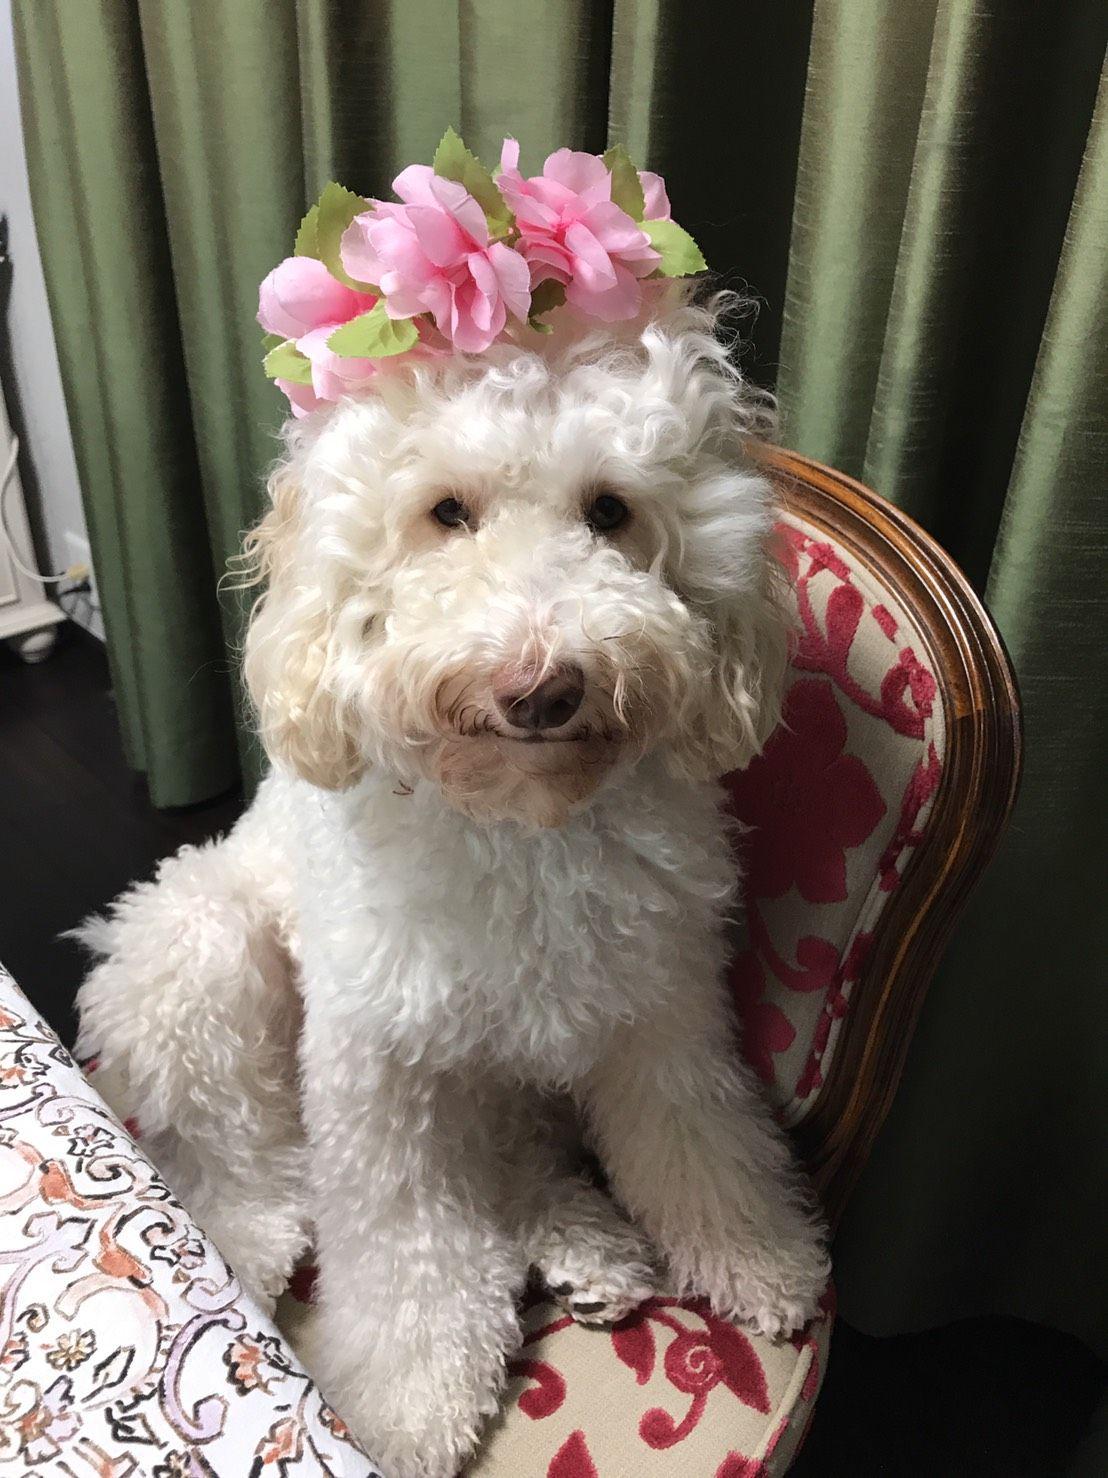 Craigslist Augusta Maine Pets - Wayang Pets